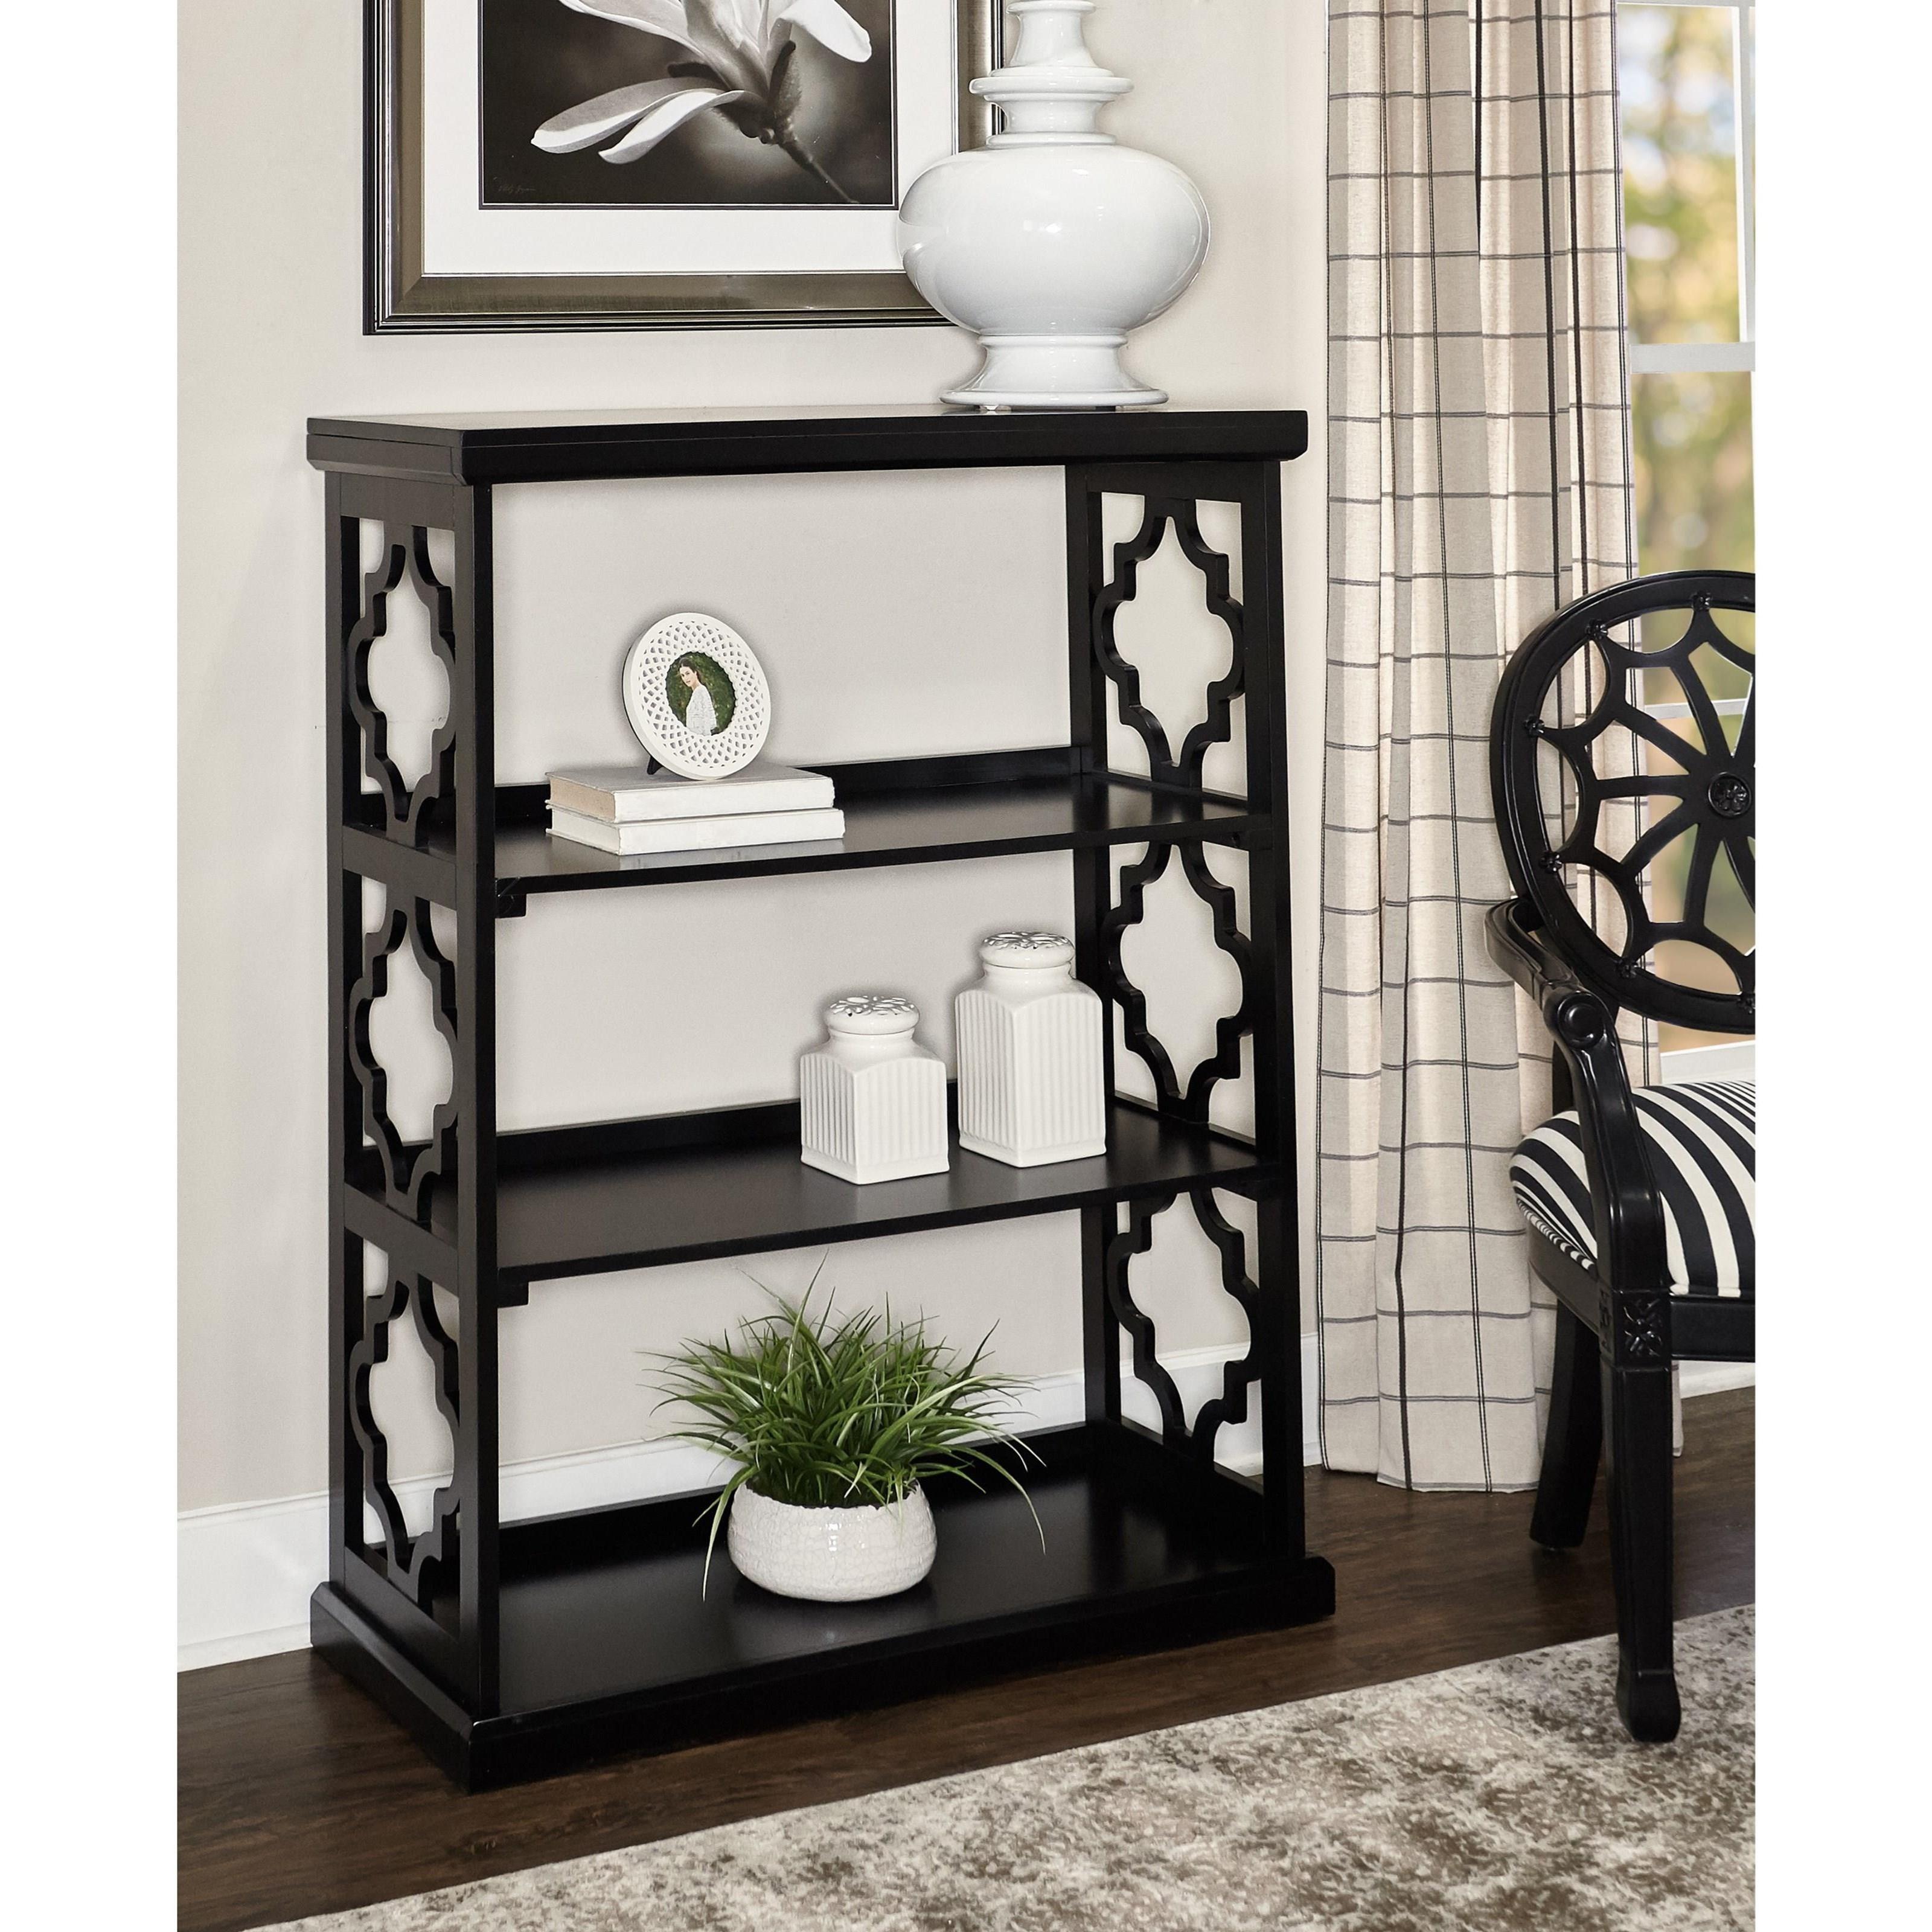 Accent Furniture Conrad Medium Bookcase Black by Powell at A1 Furniture & Mattress